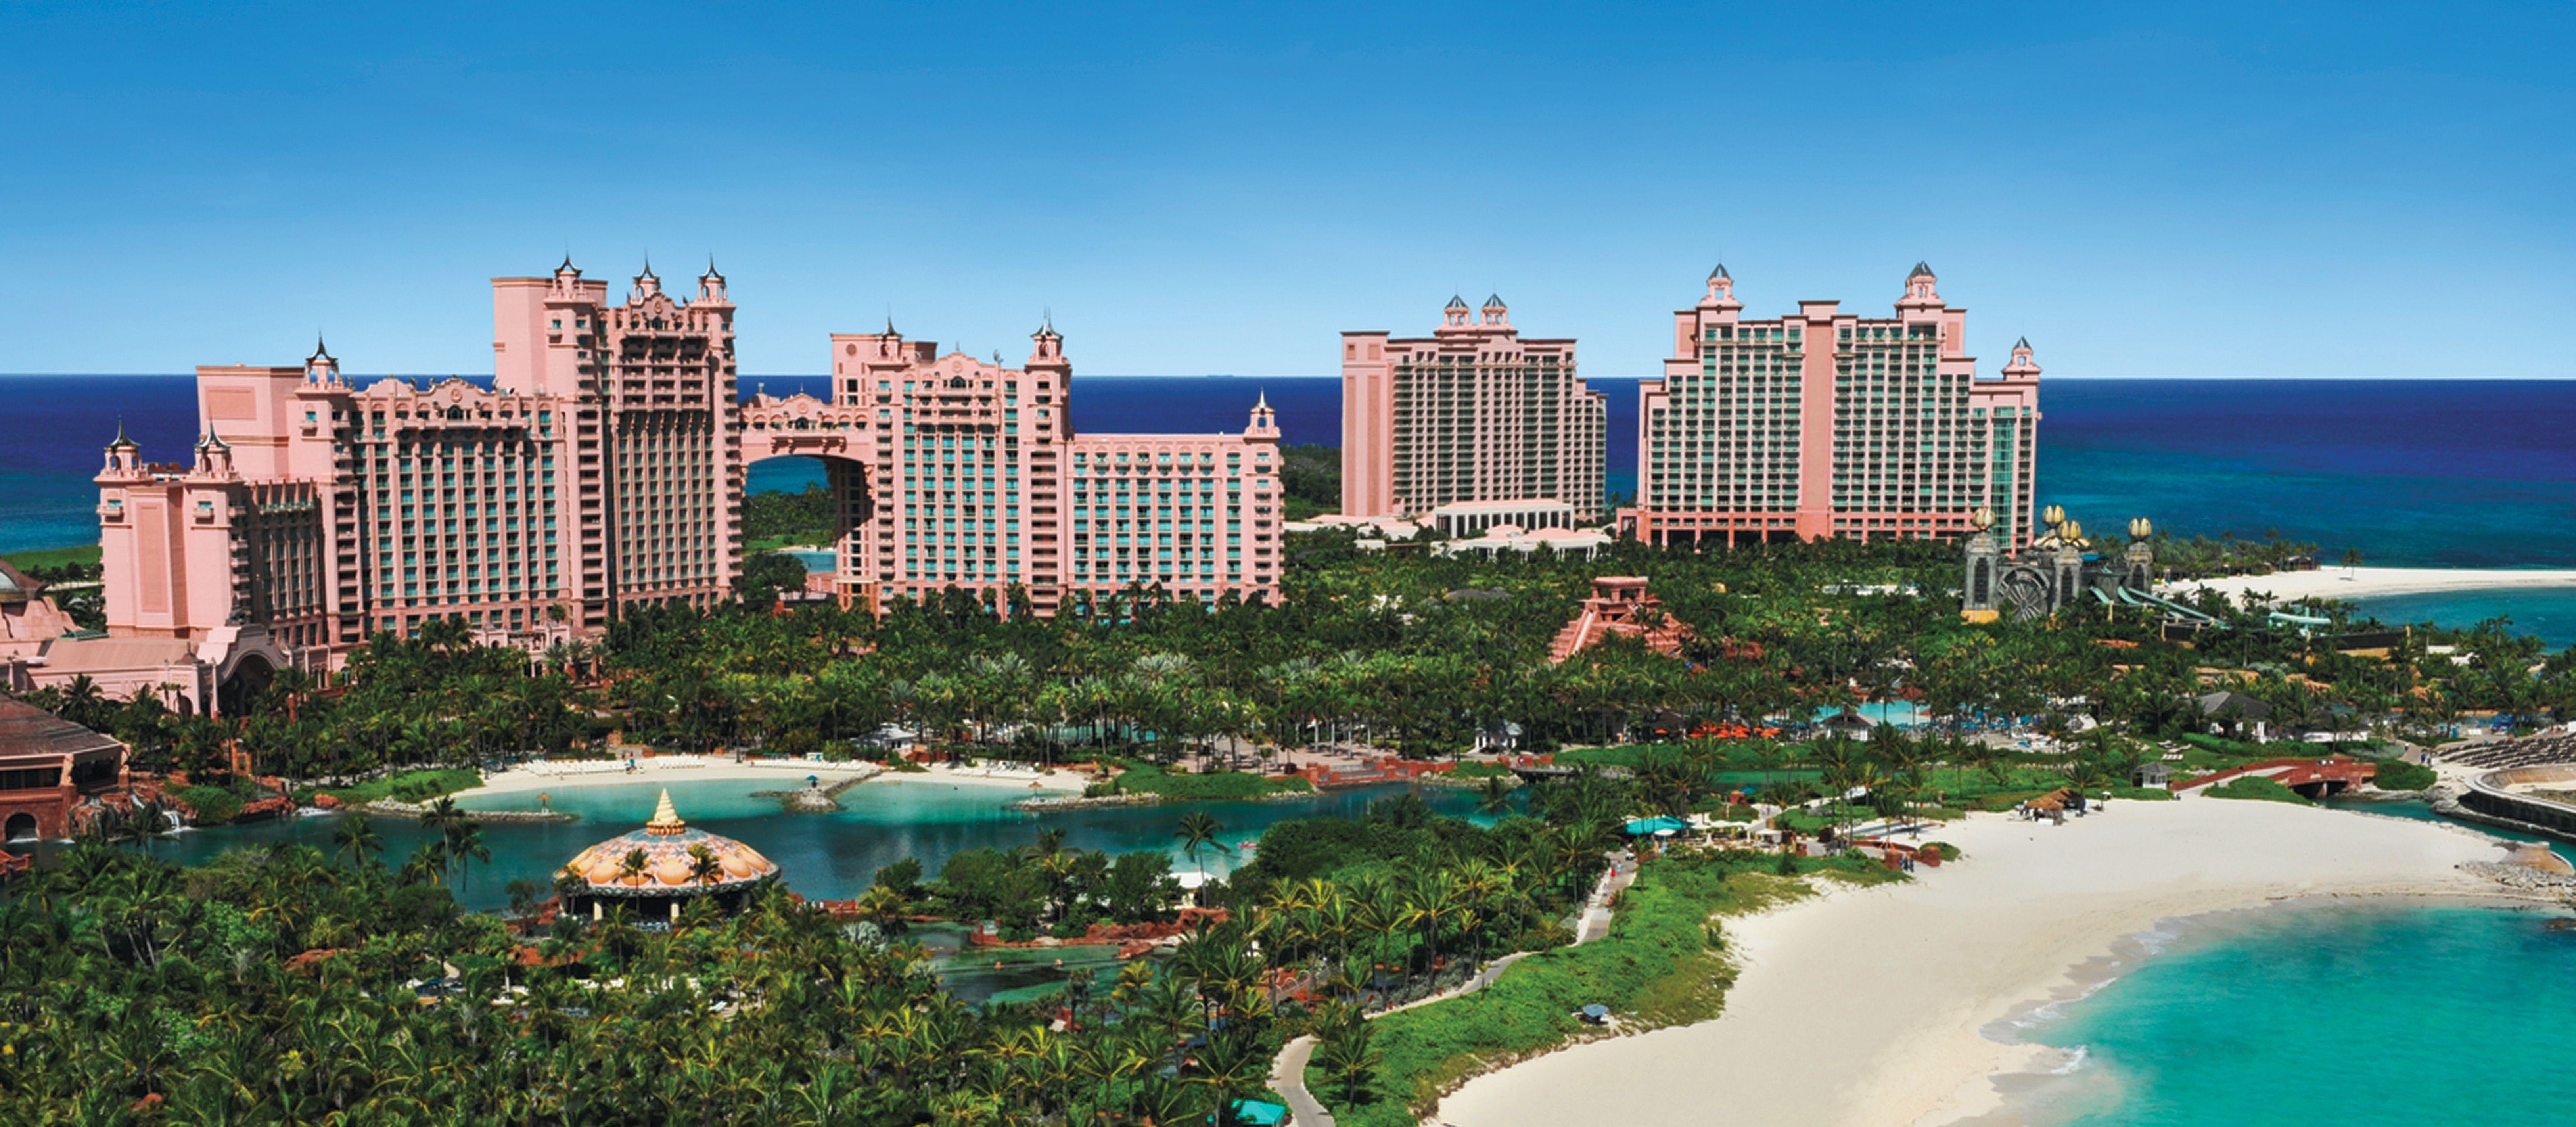 book a vacation to atlantis paradise island bahamas and save when you book air hotel through jetblue vacations - Bahamas Resorts Hotels